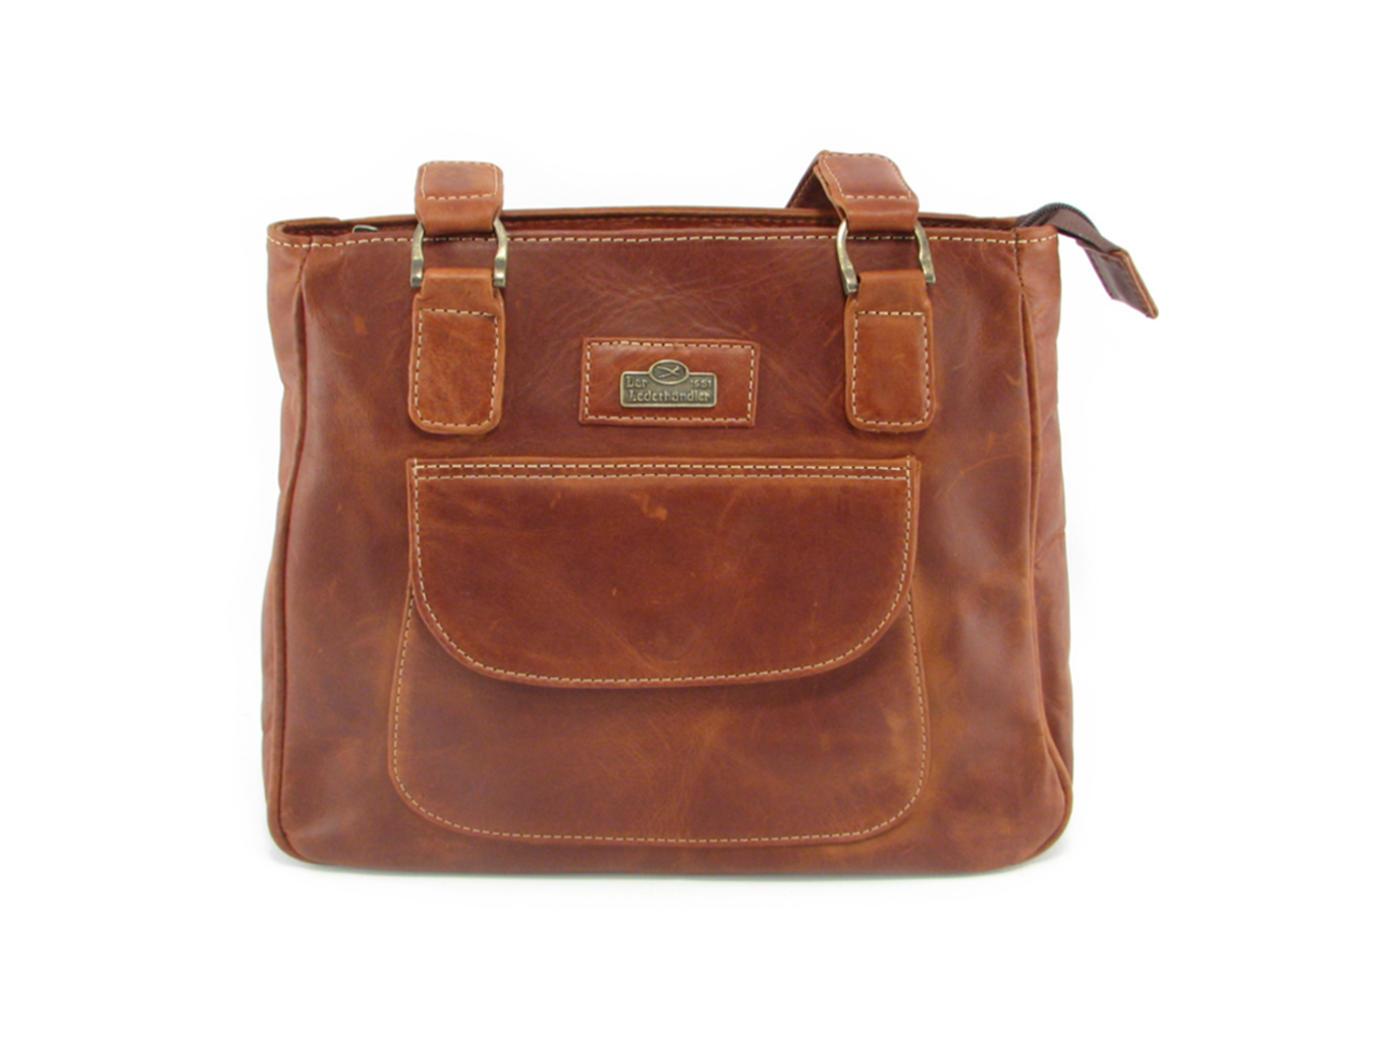 9ddb3e5ce2 Isabel HP7287 front classic handbag leather bags women, Der Lederhandler,  George, Western Cape